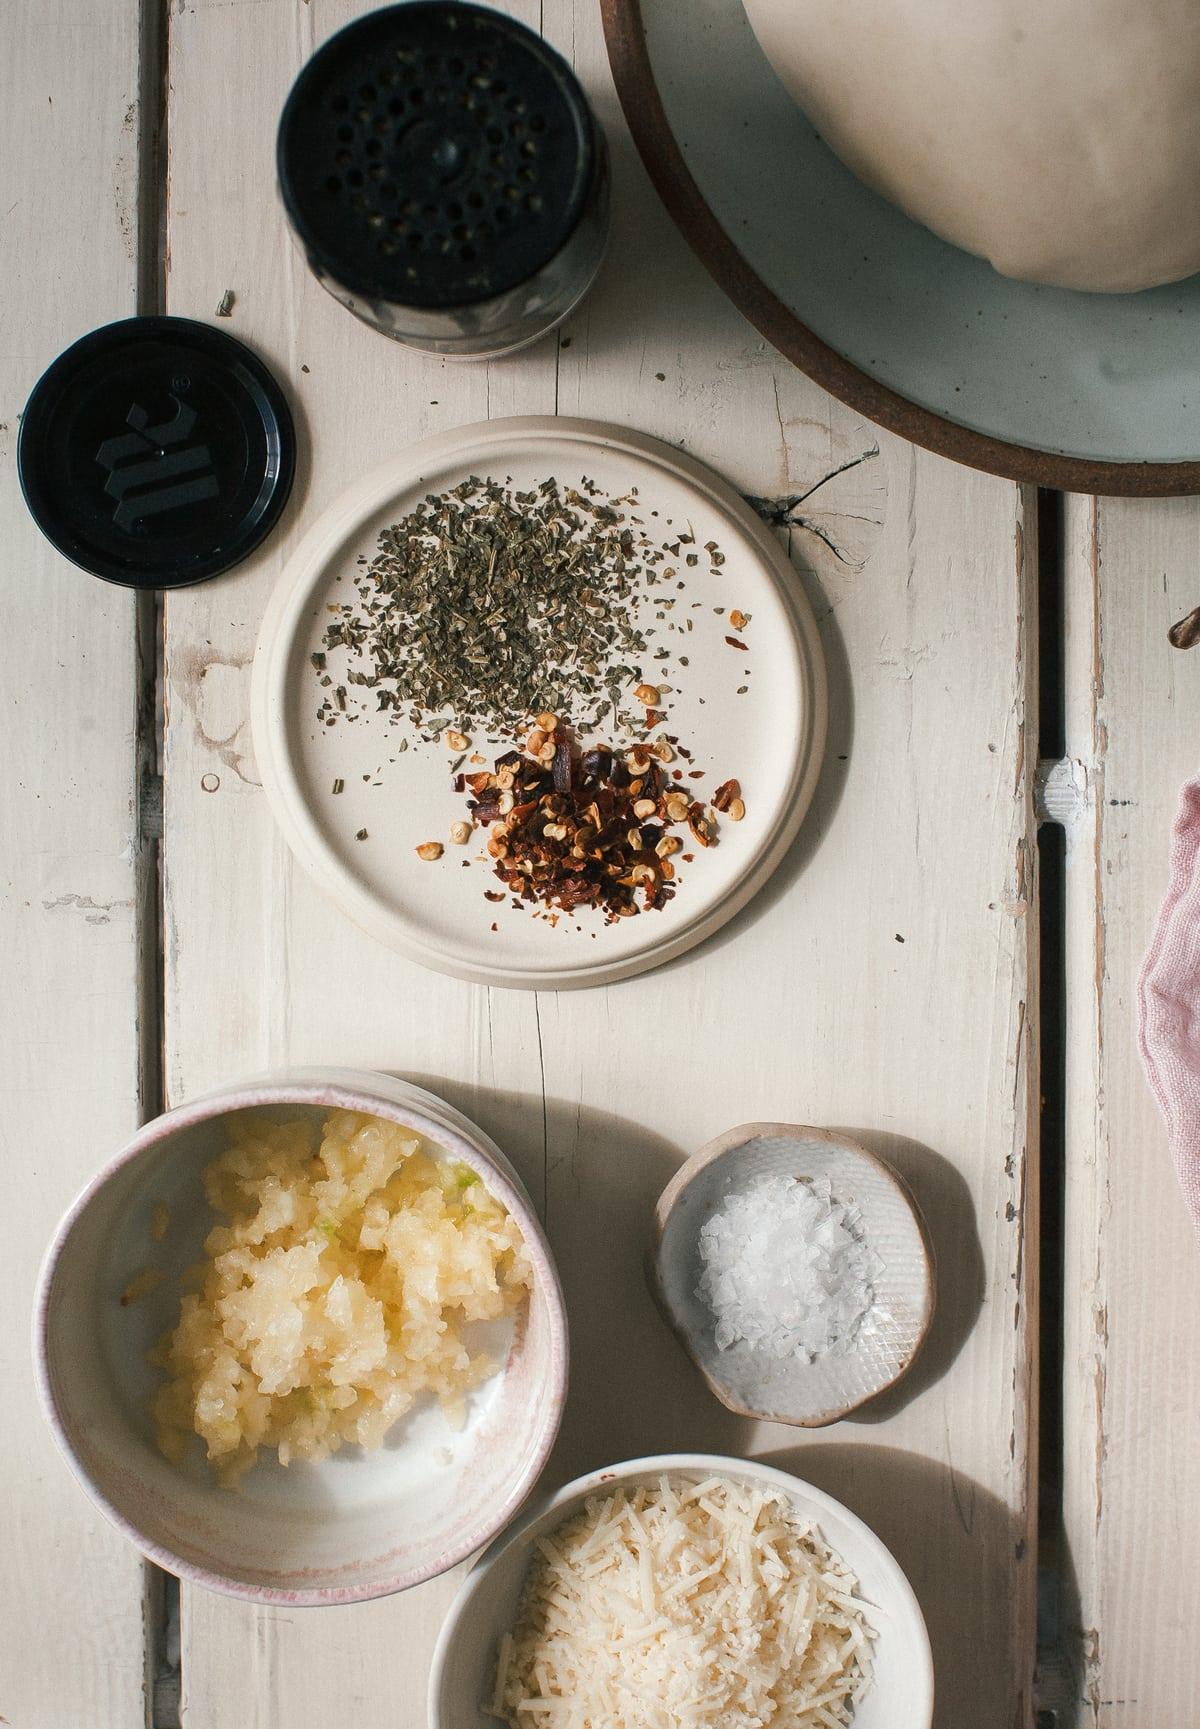 Garlic-y Olive-y Pull Apart Knots